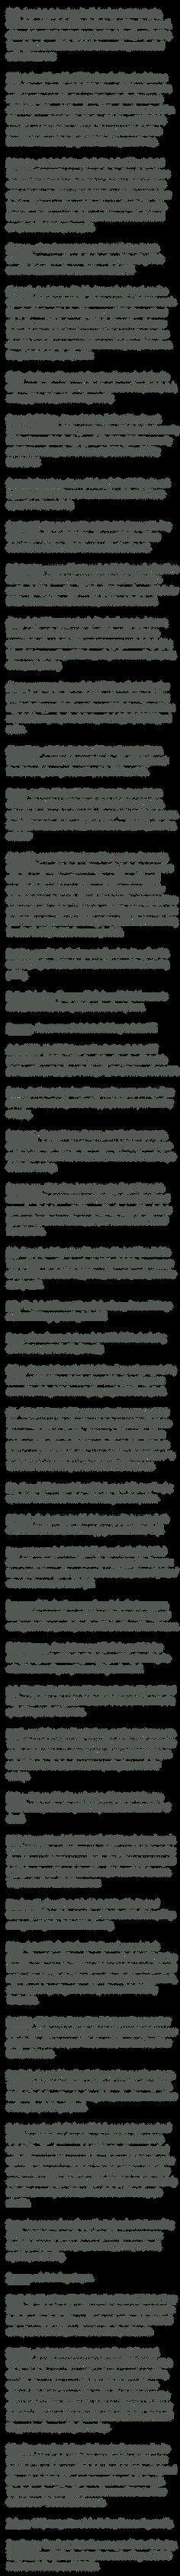 deviantART dictionary